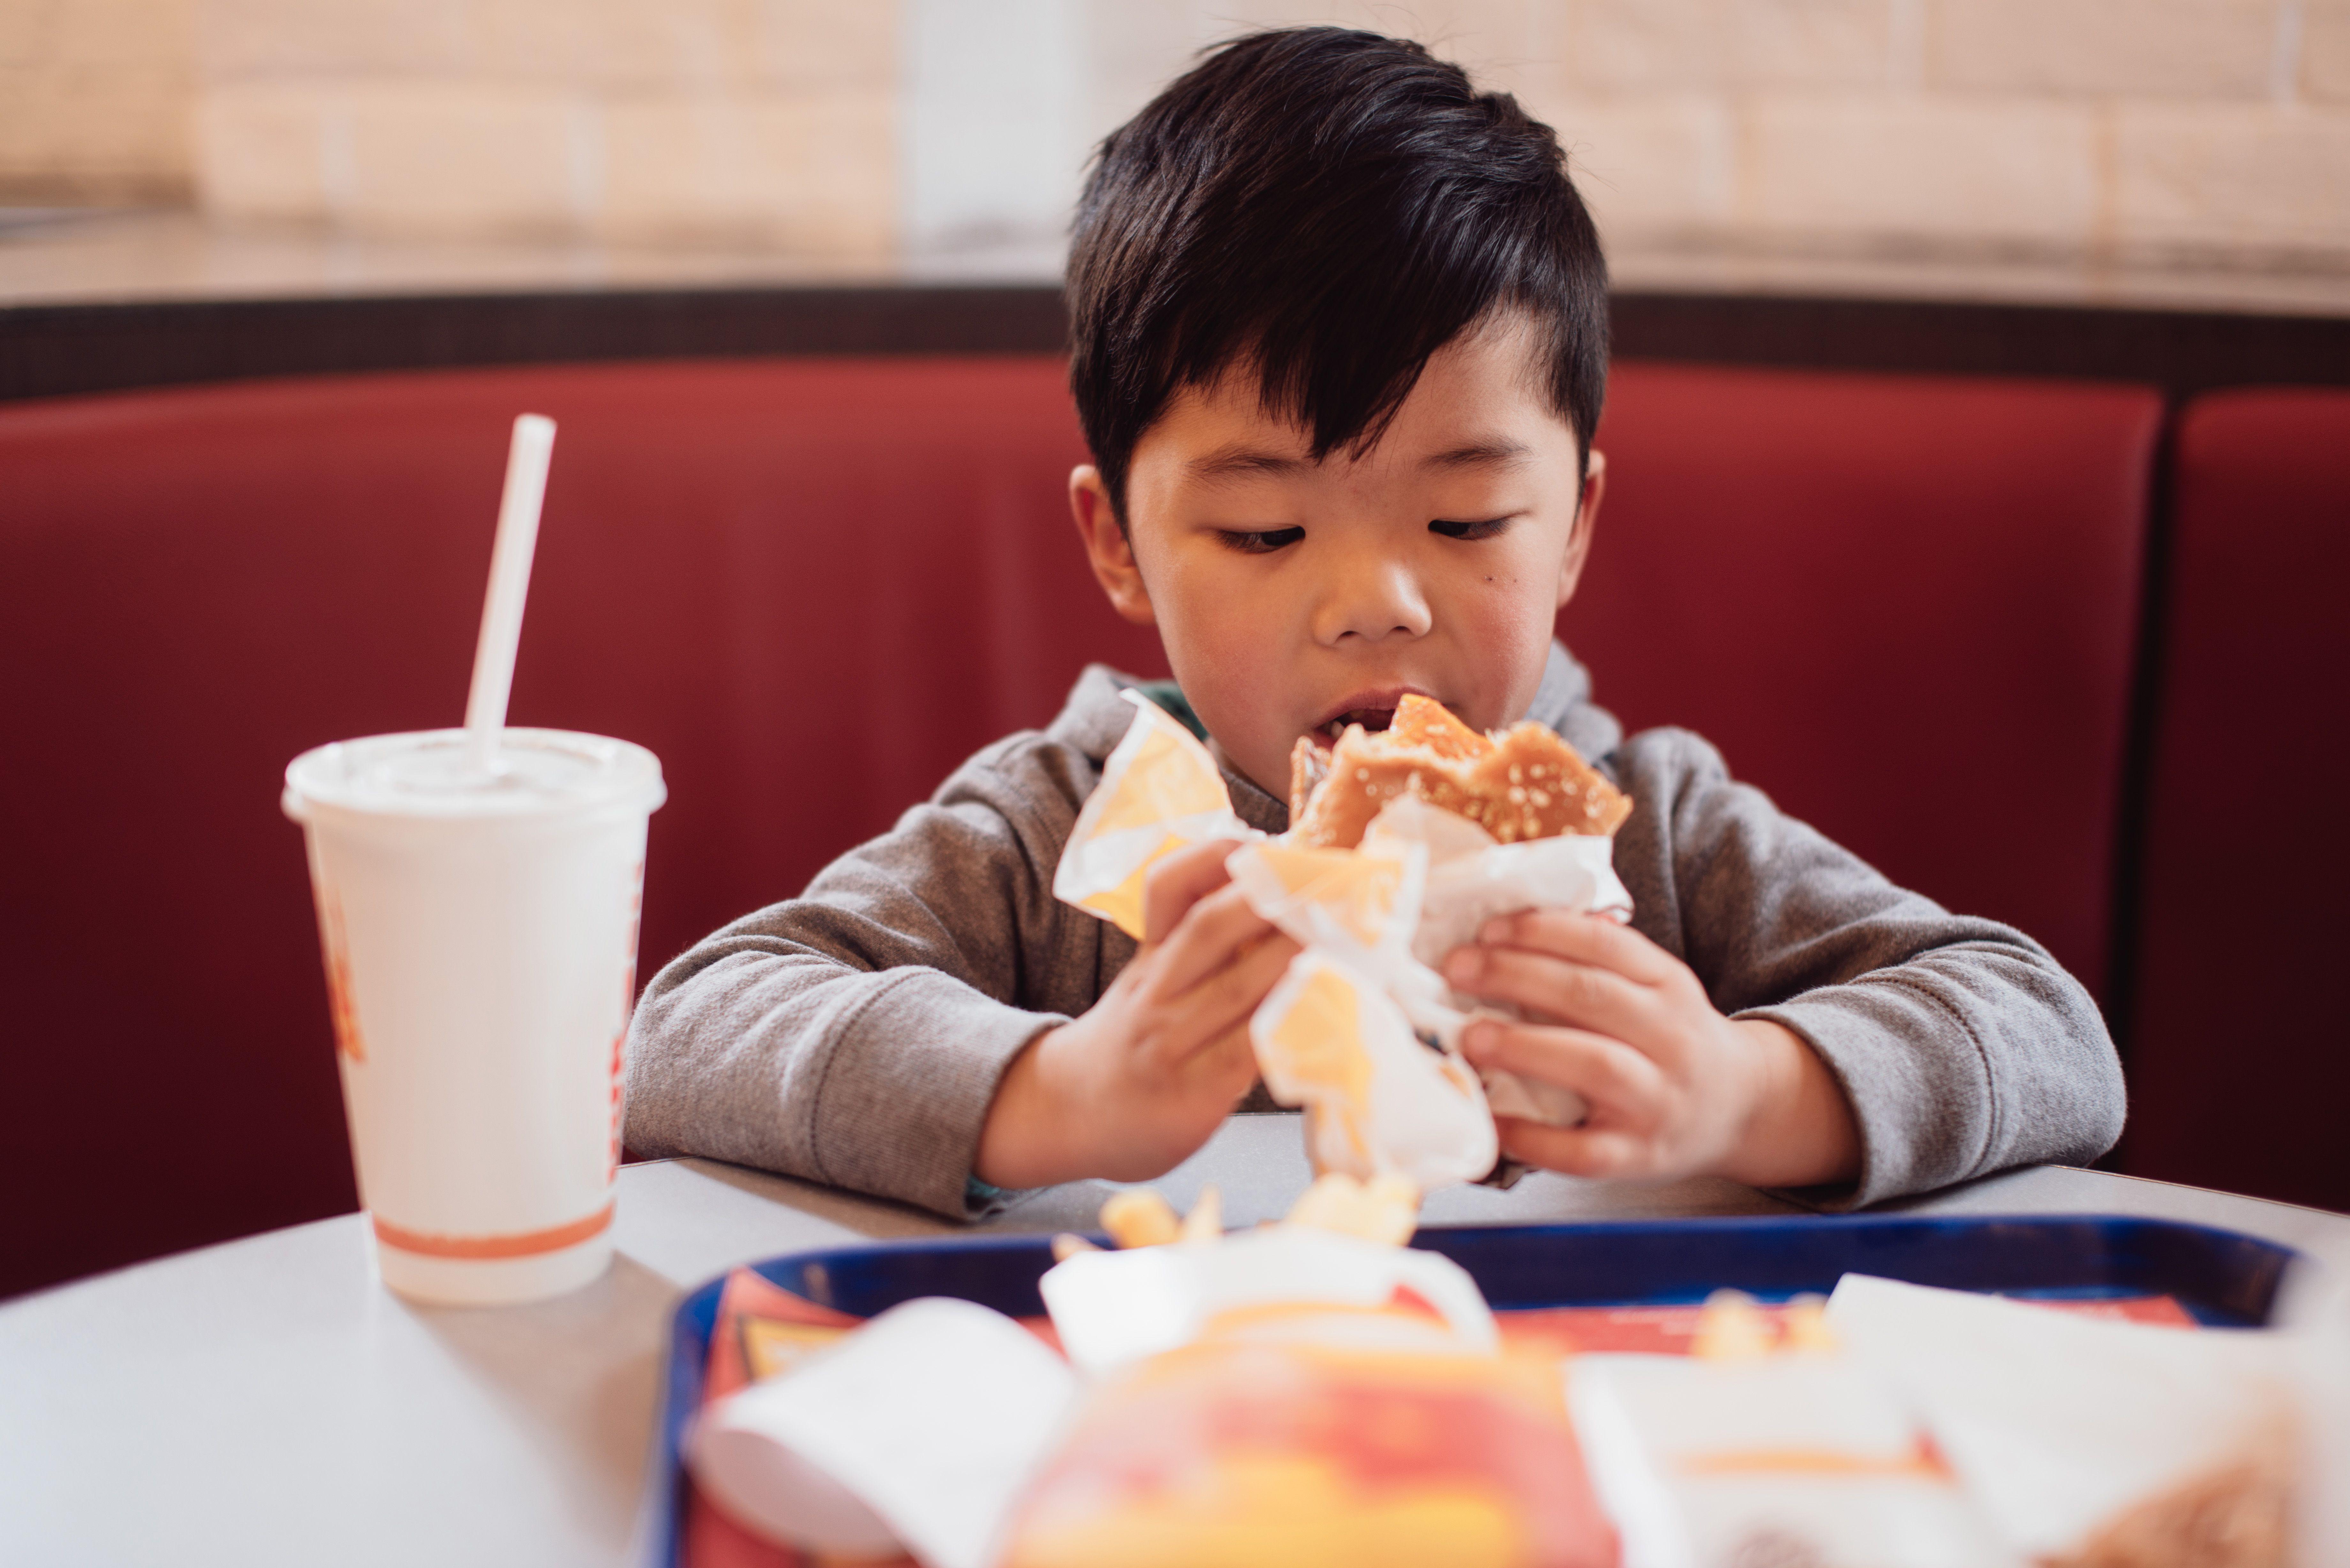 McDonald s Happy Meal Nutrition Information